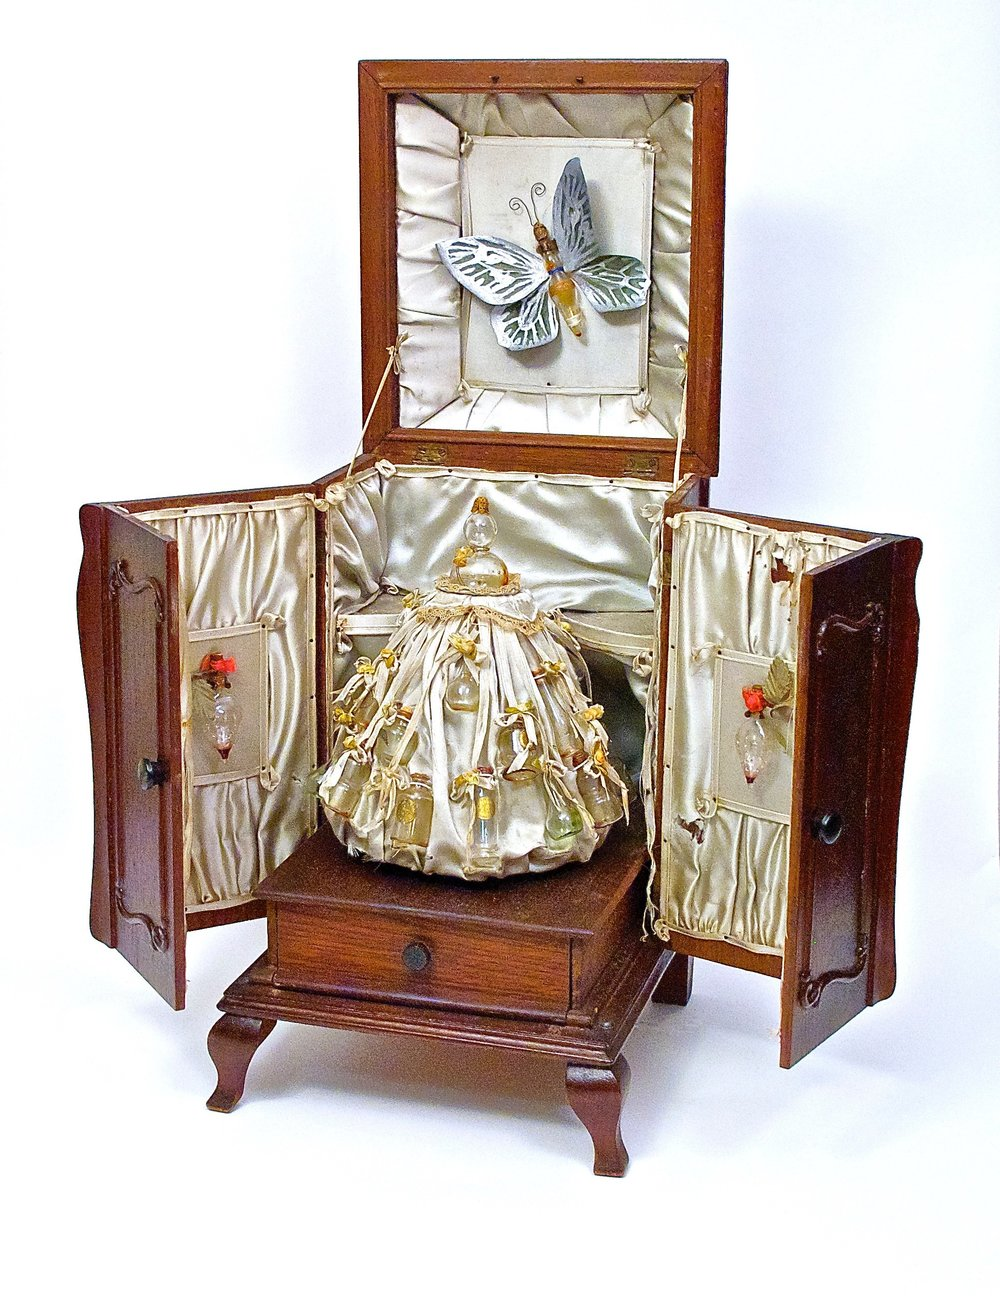 1920s Hetra-Czech Holman perfume Victrola $9,600